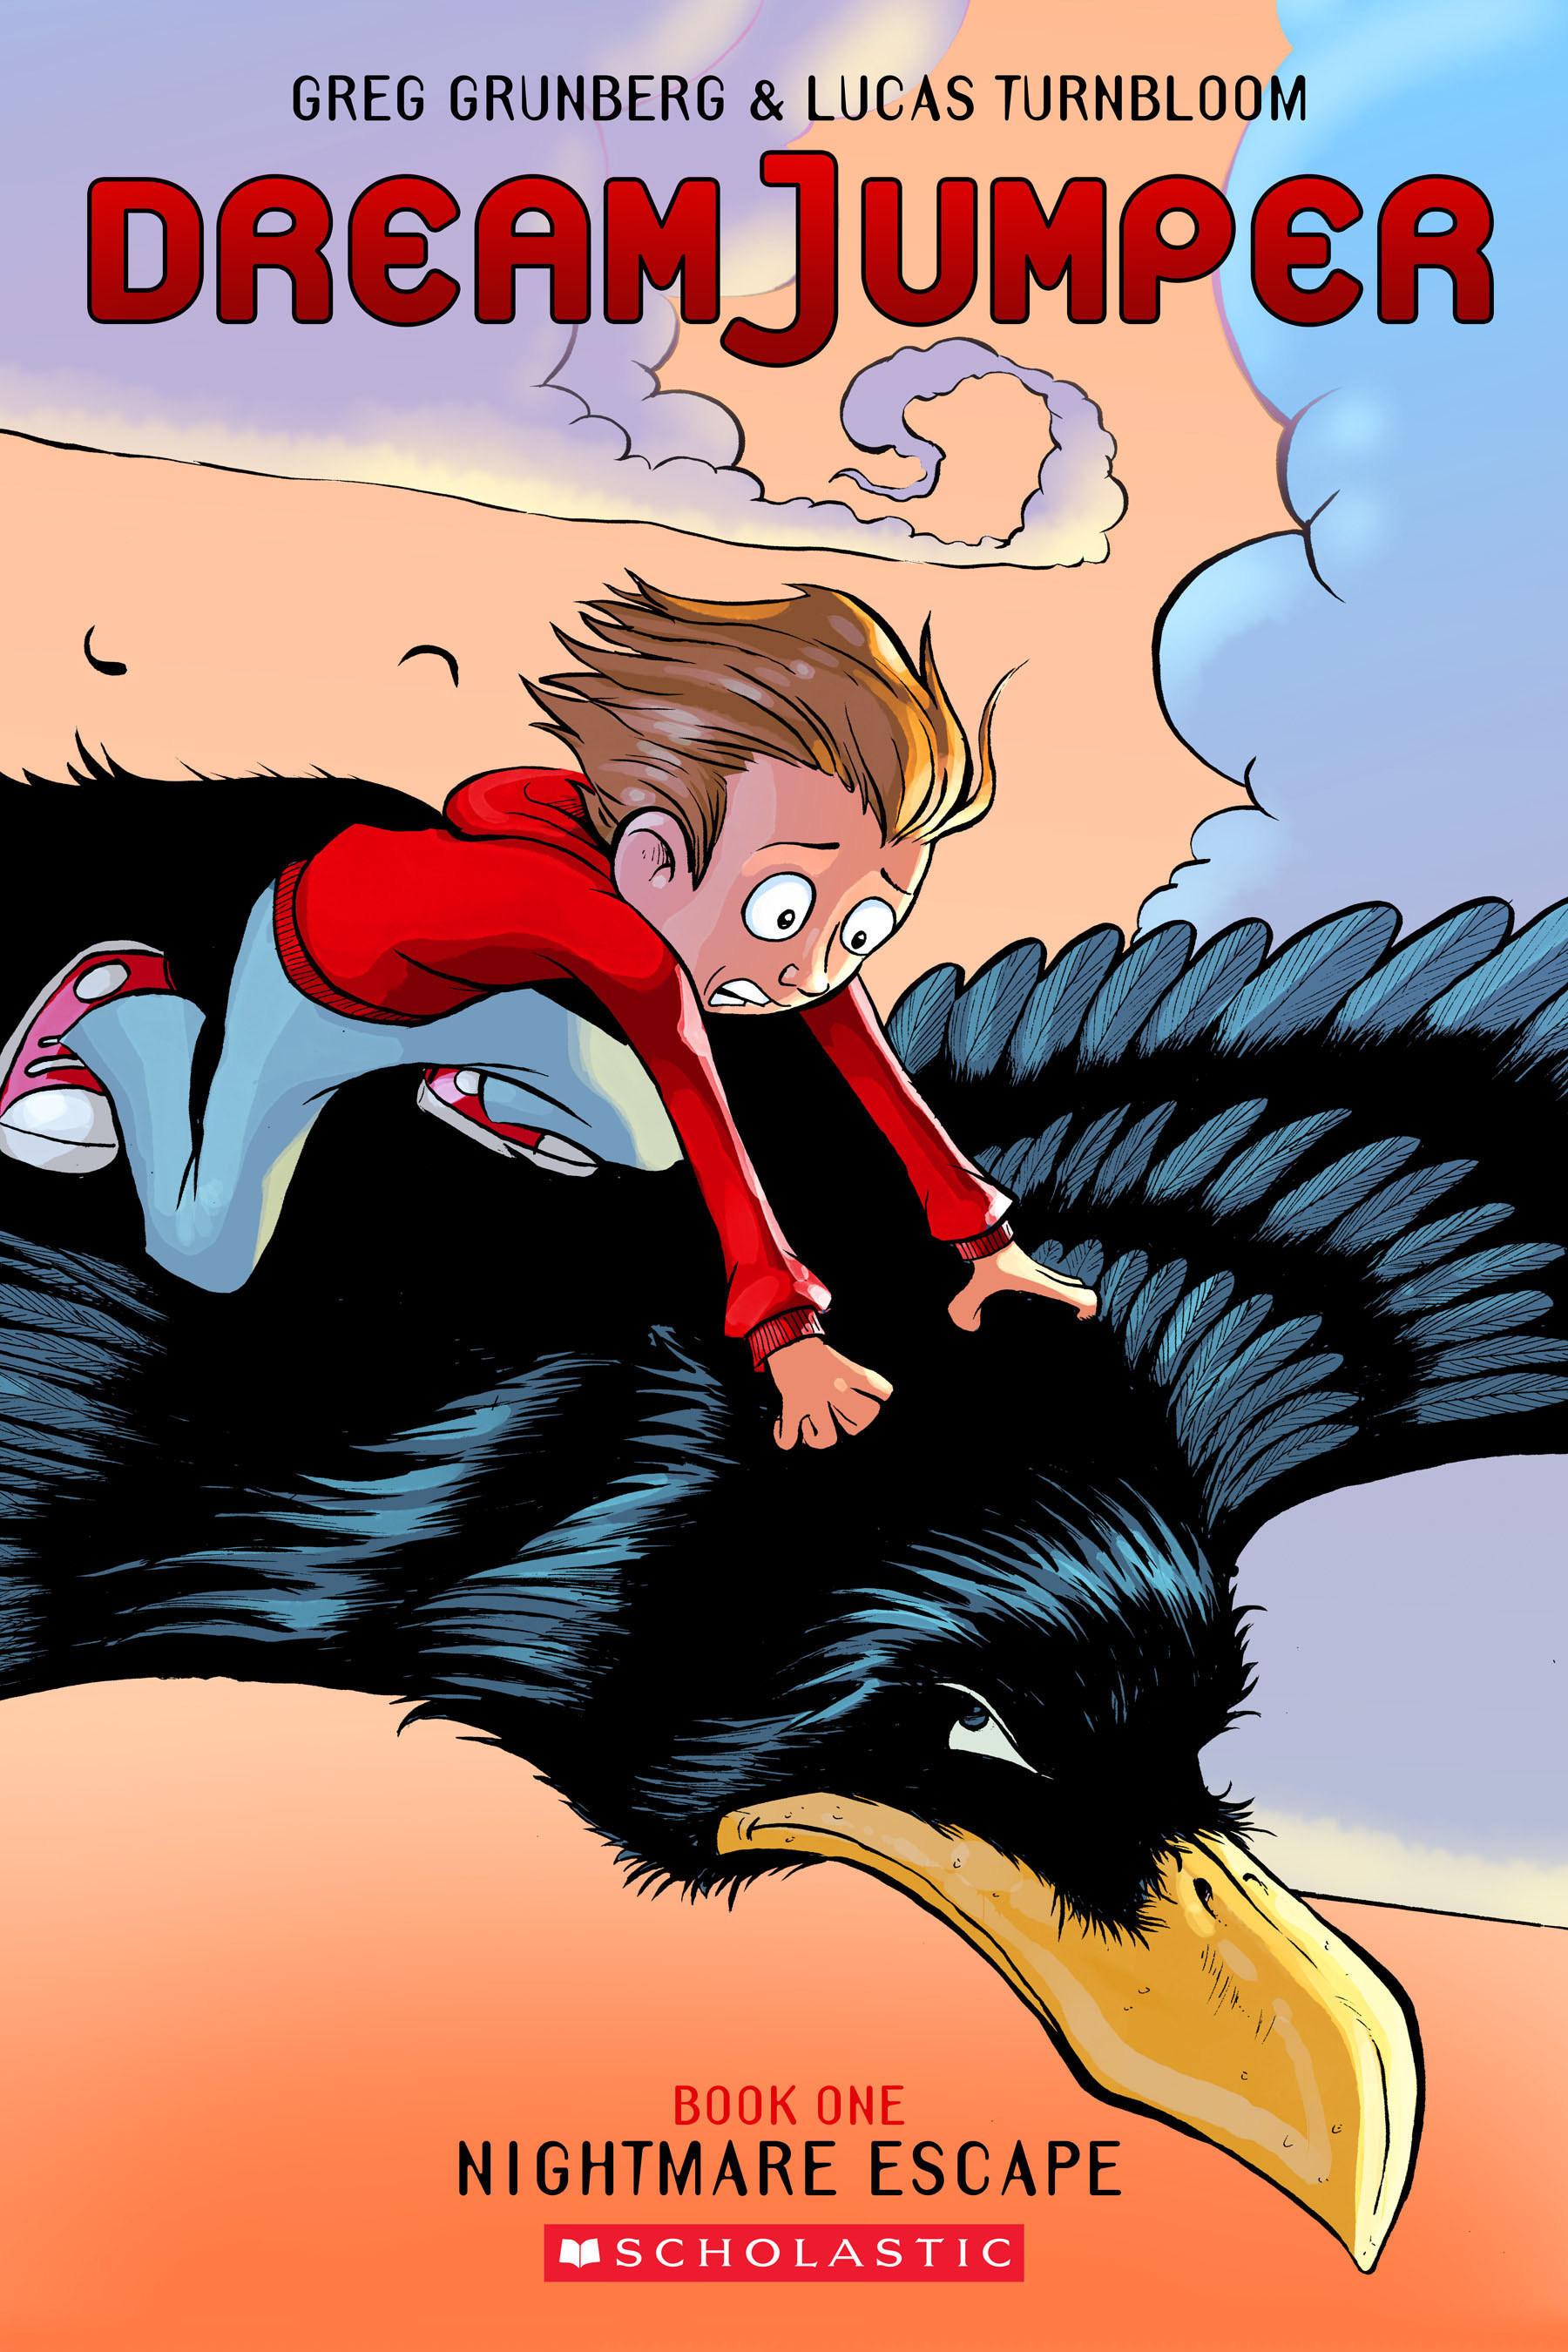 Dream Jumper by Greg Grunberg and Lucas Turnbloom